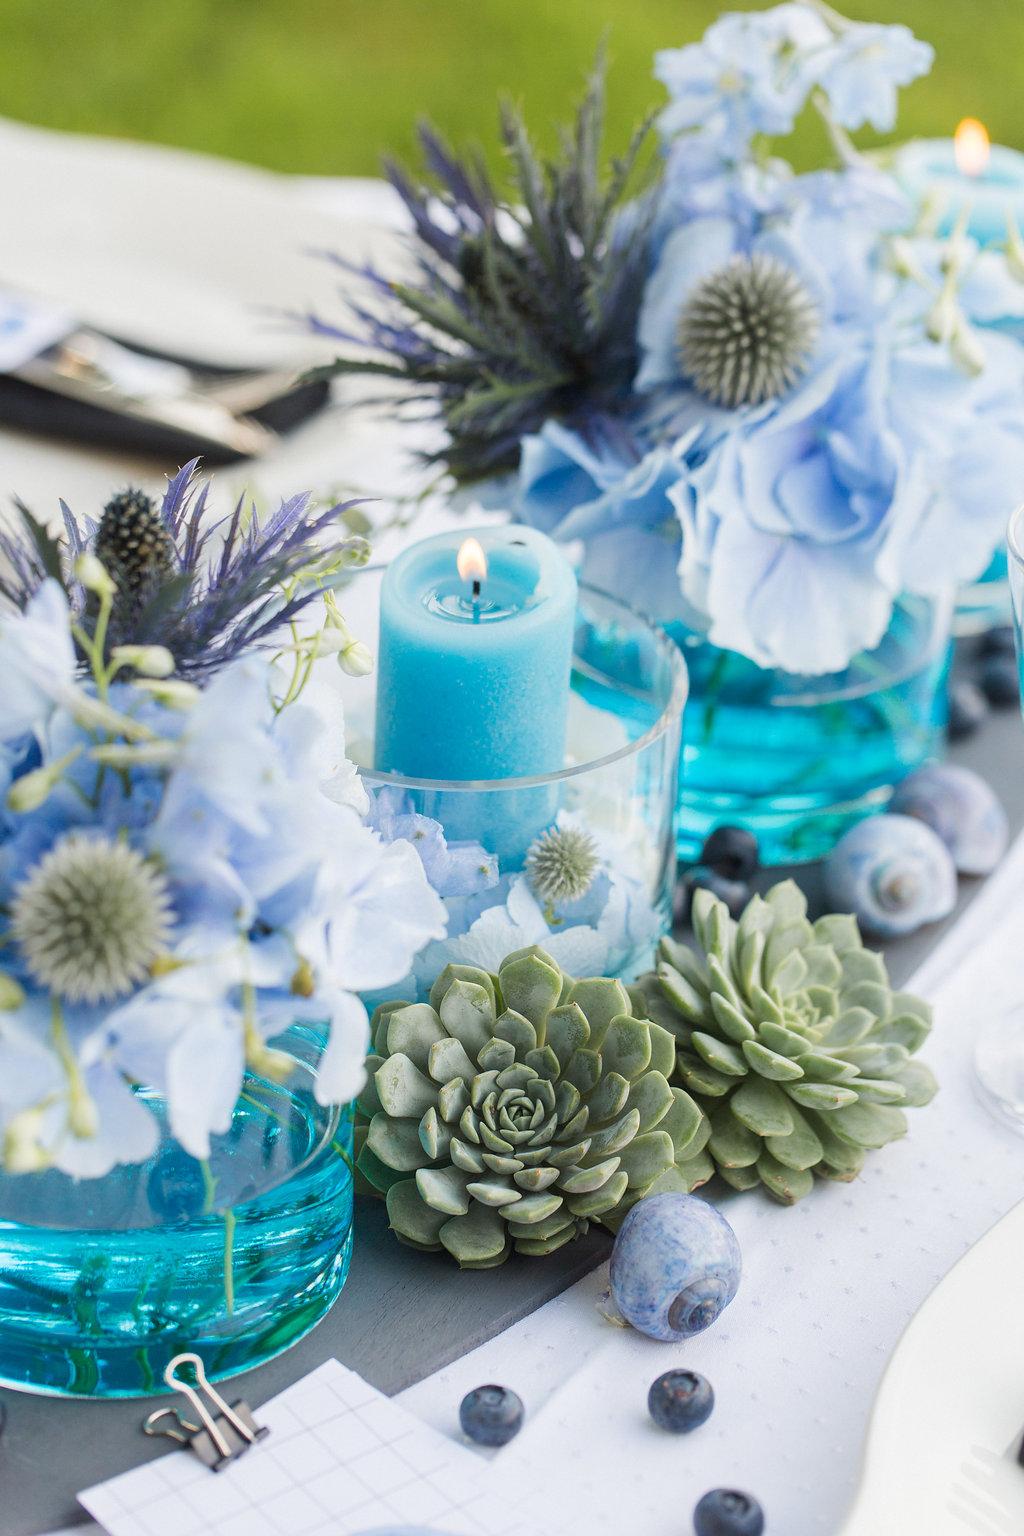 Julia_Schick_Fotografie_Gefaesse_Florale_Manufaktur_-2358